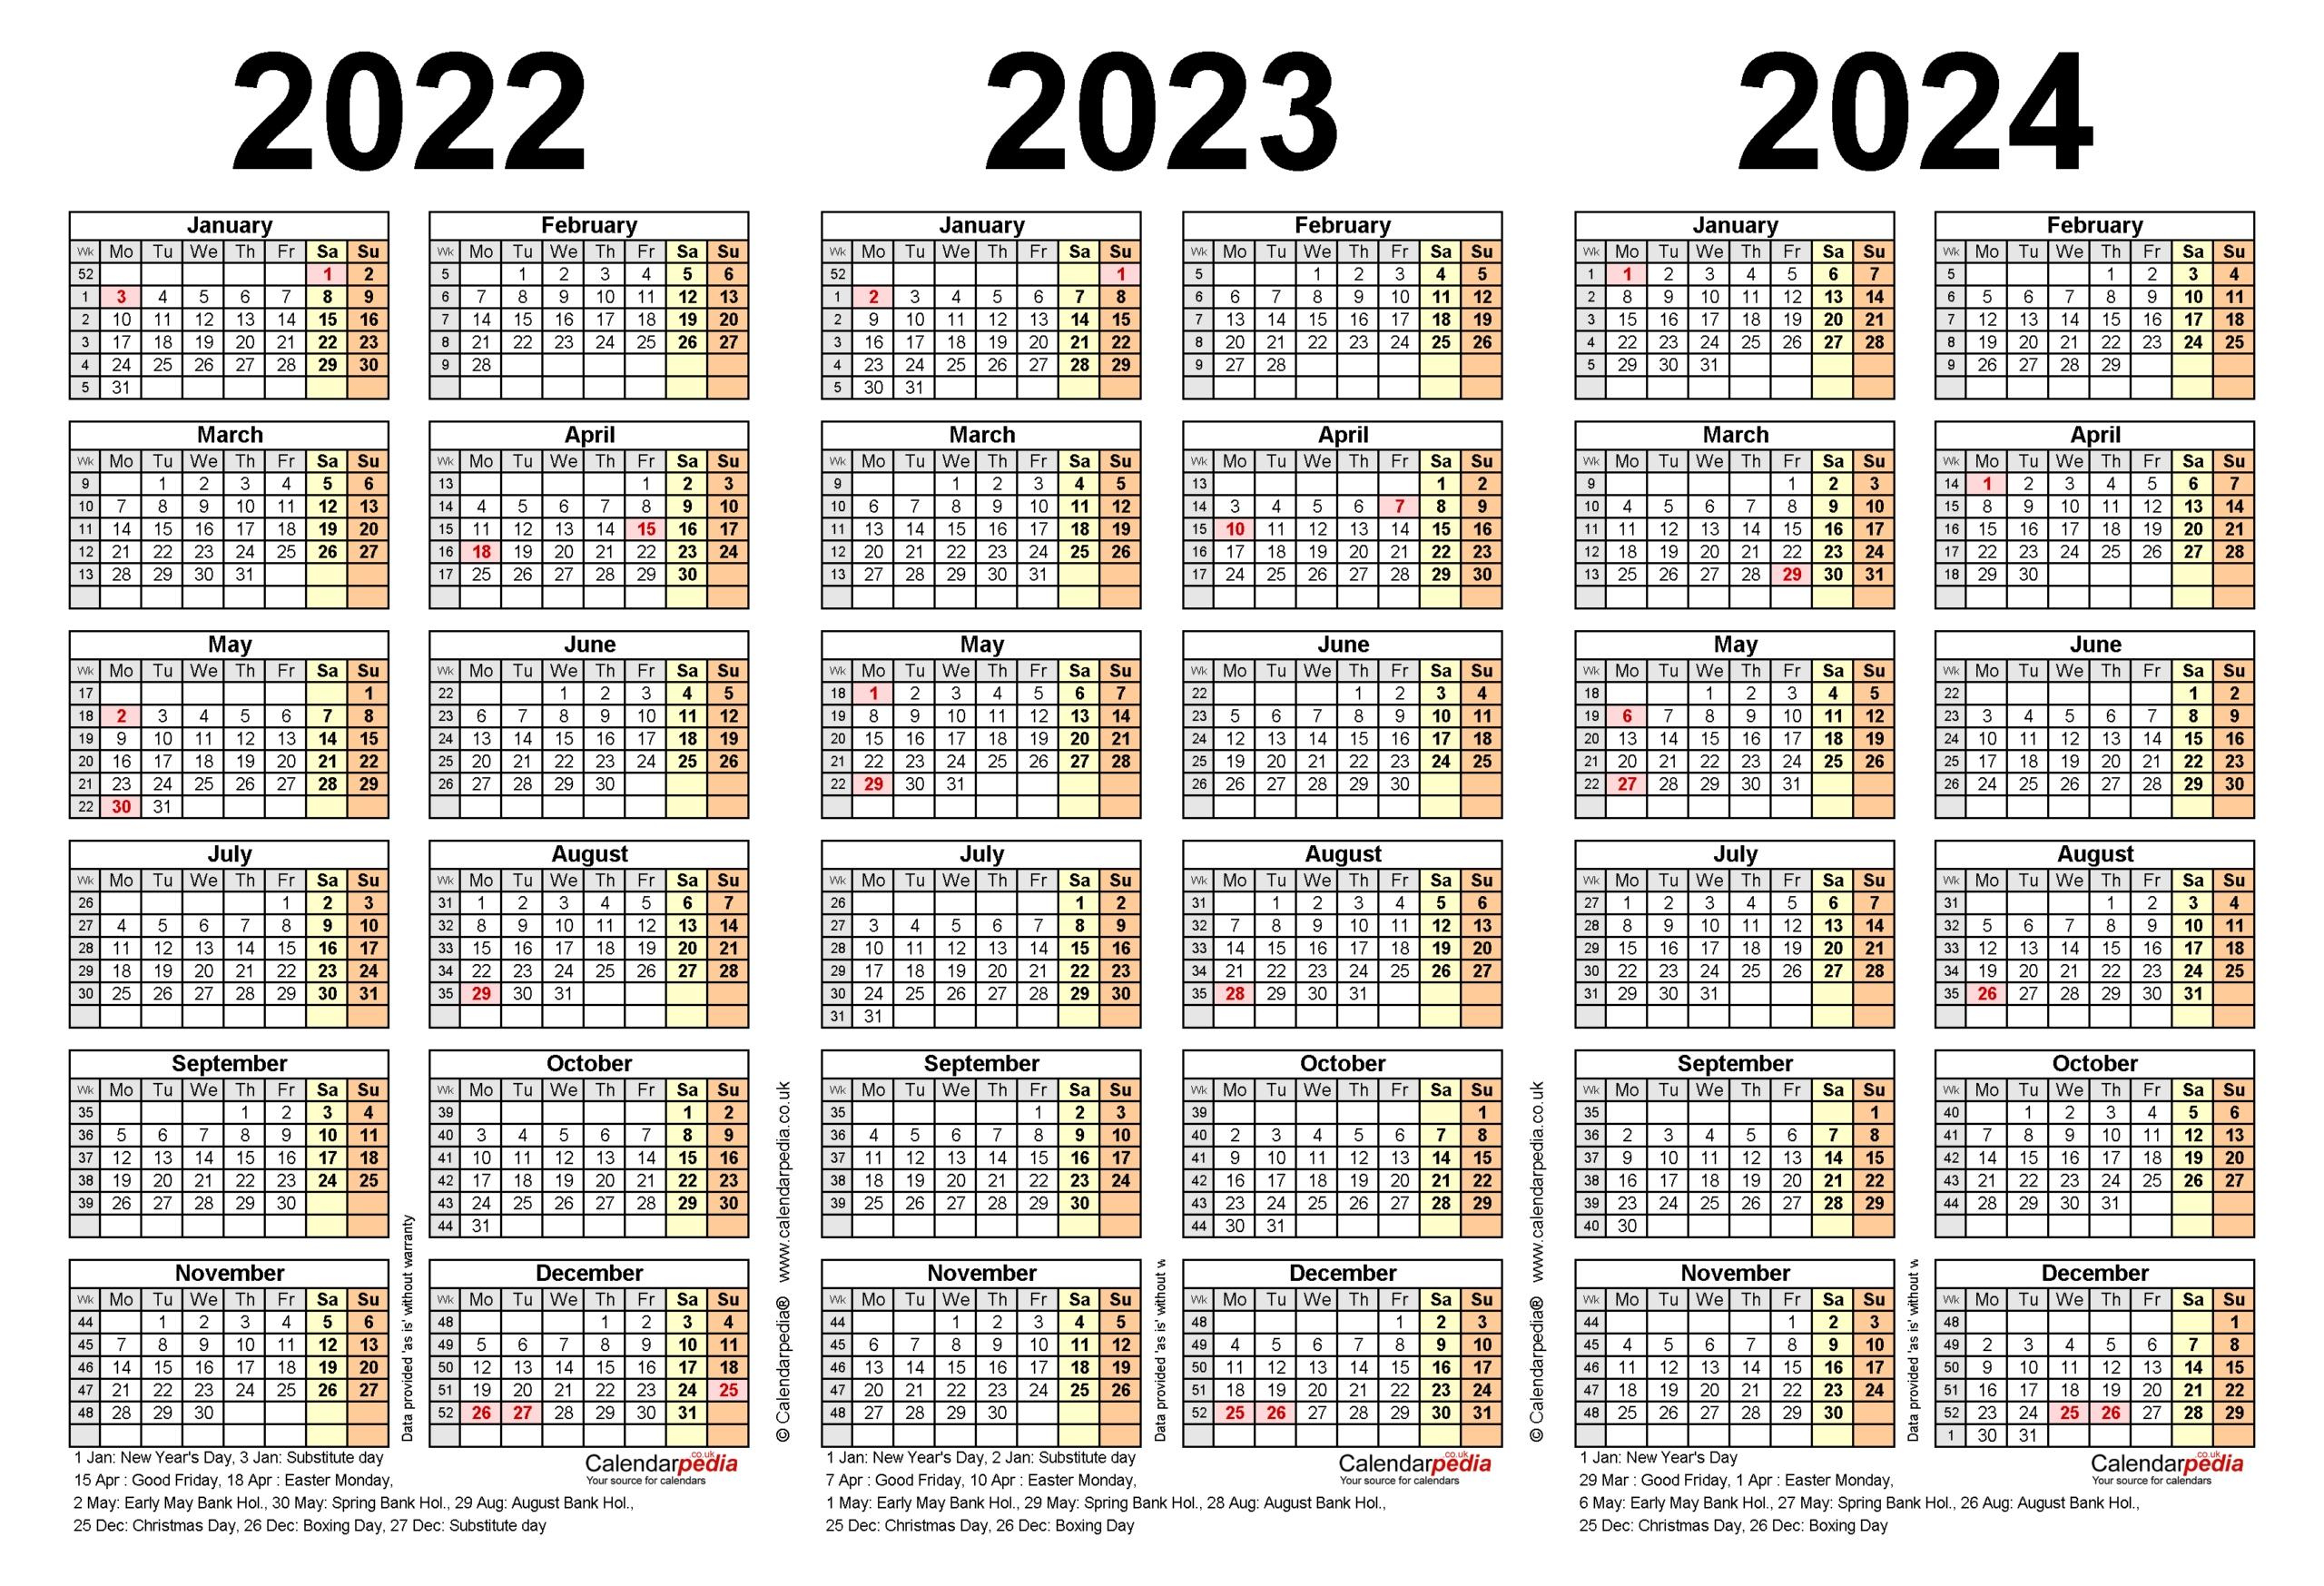 Get Calendars 2021 2022 2023 Free Printable